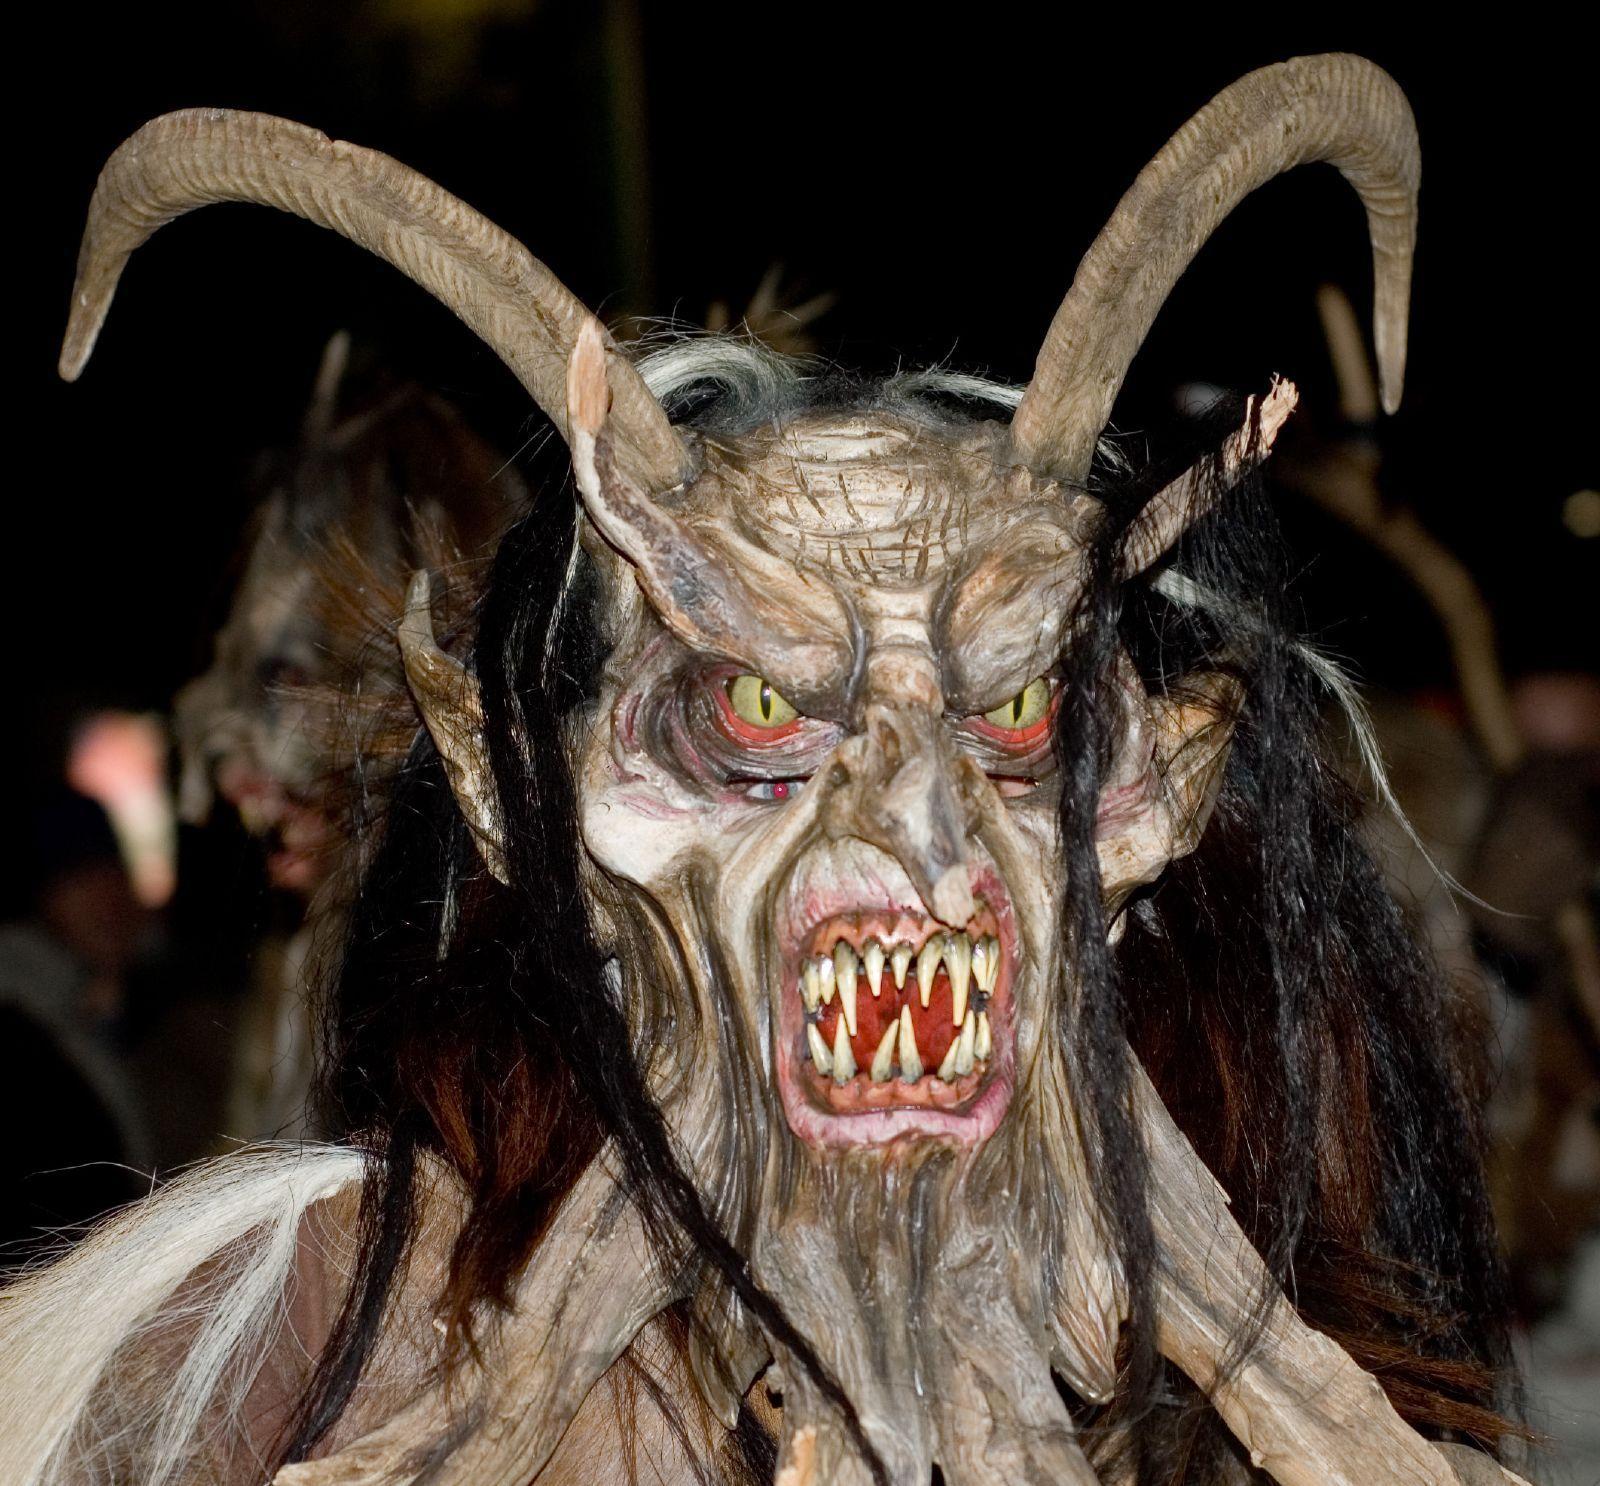 Meet Krampus The Evil German Santa Claus Krampus Mythical Creatures Creatures